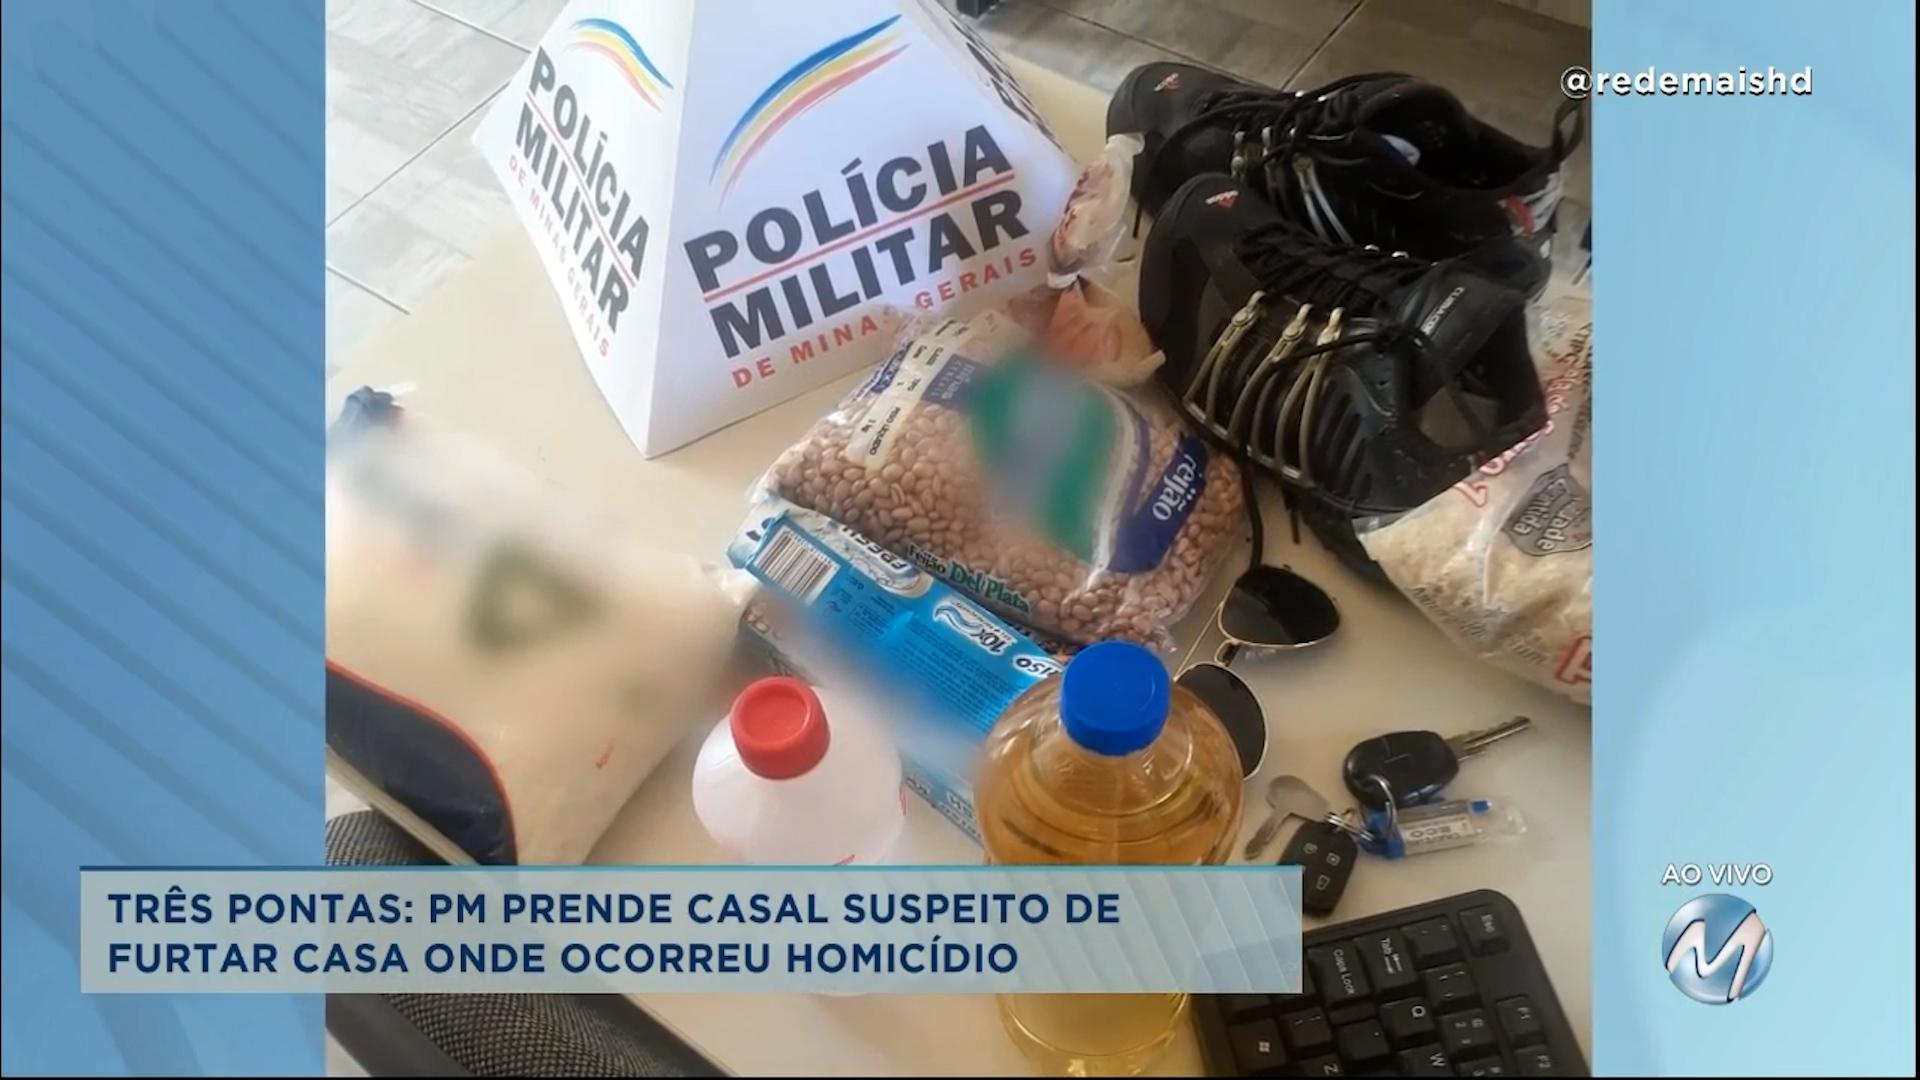 Três Pontas: PM prende casal suspeito de furtar casa onde ocorreu homicídio